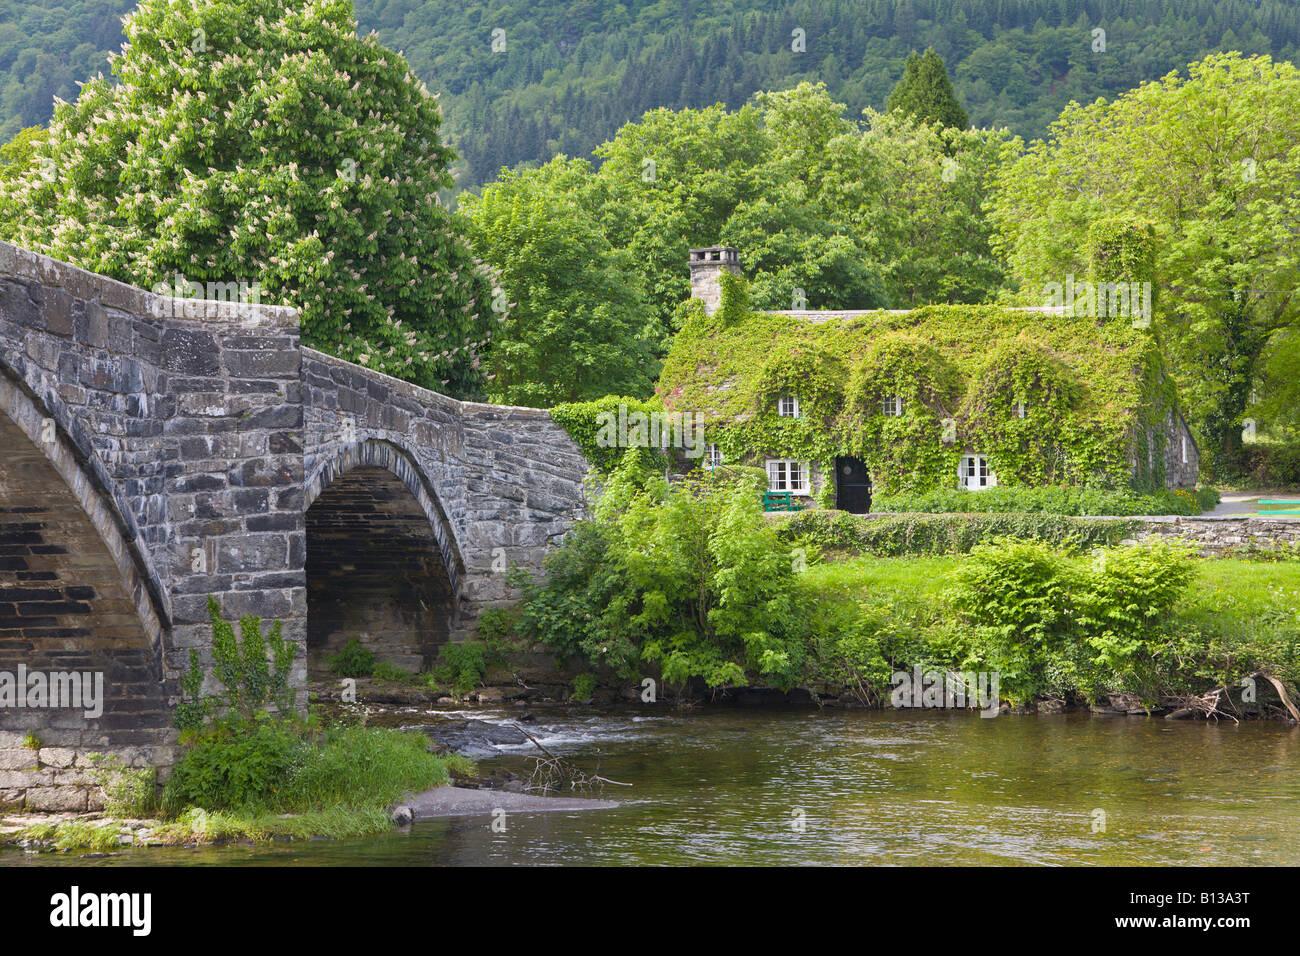 Ivy Covered Cottage And Inigo Jones Bridge, Llanrwst